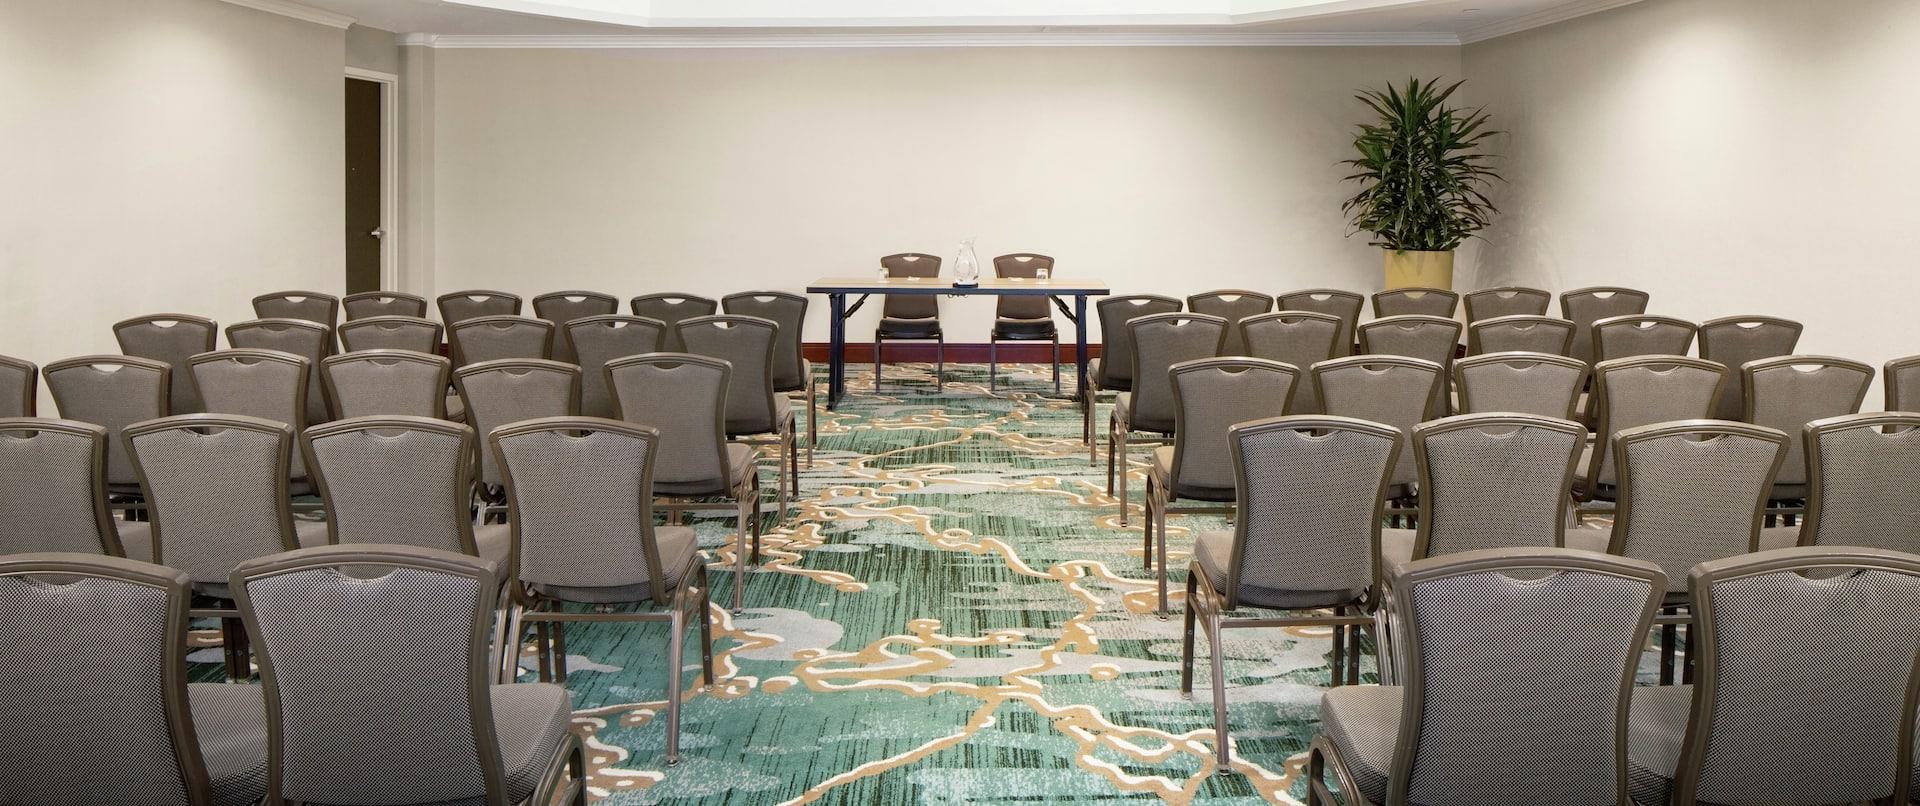 Dartmouth Meeting Room